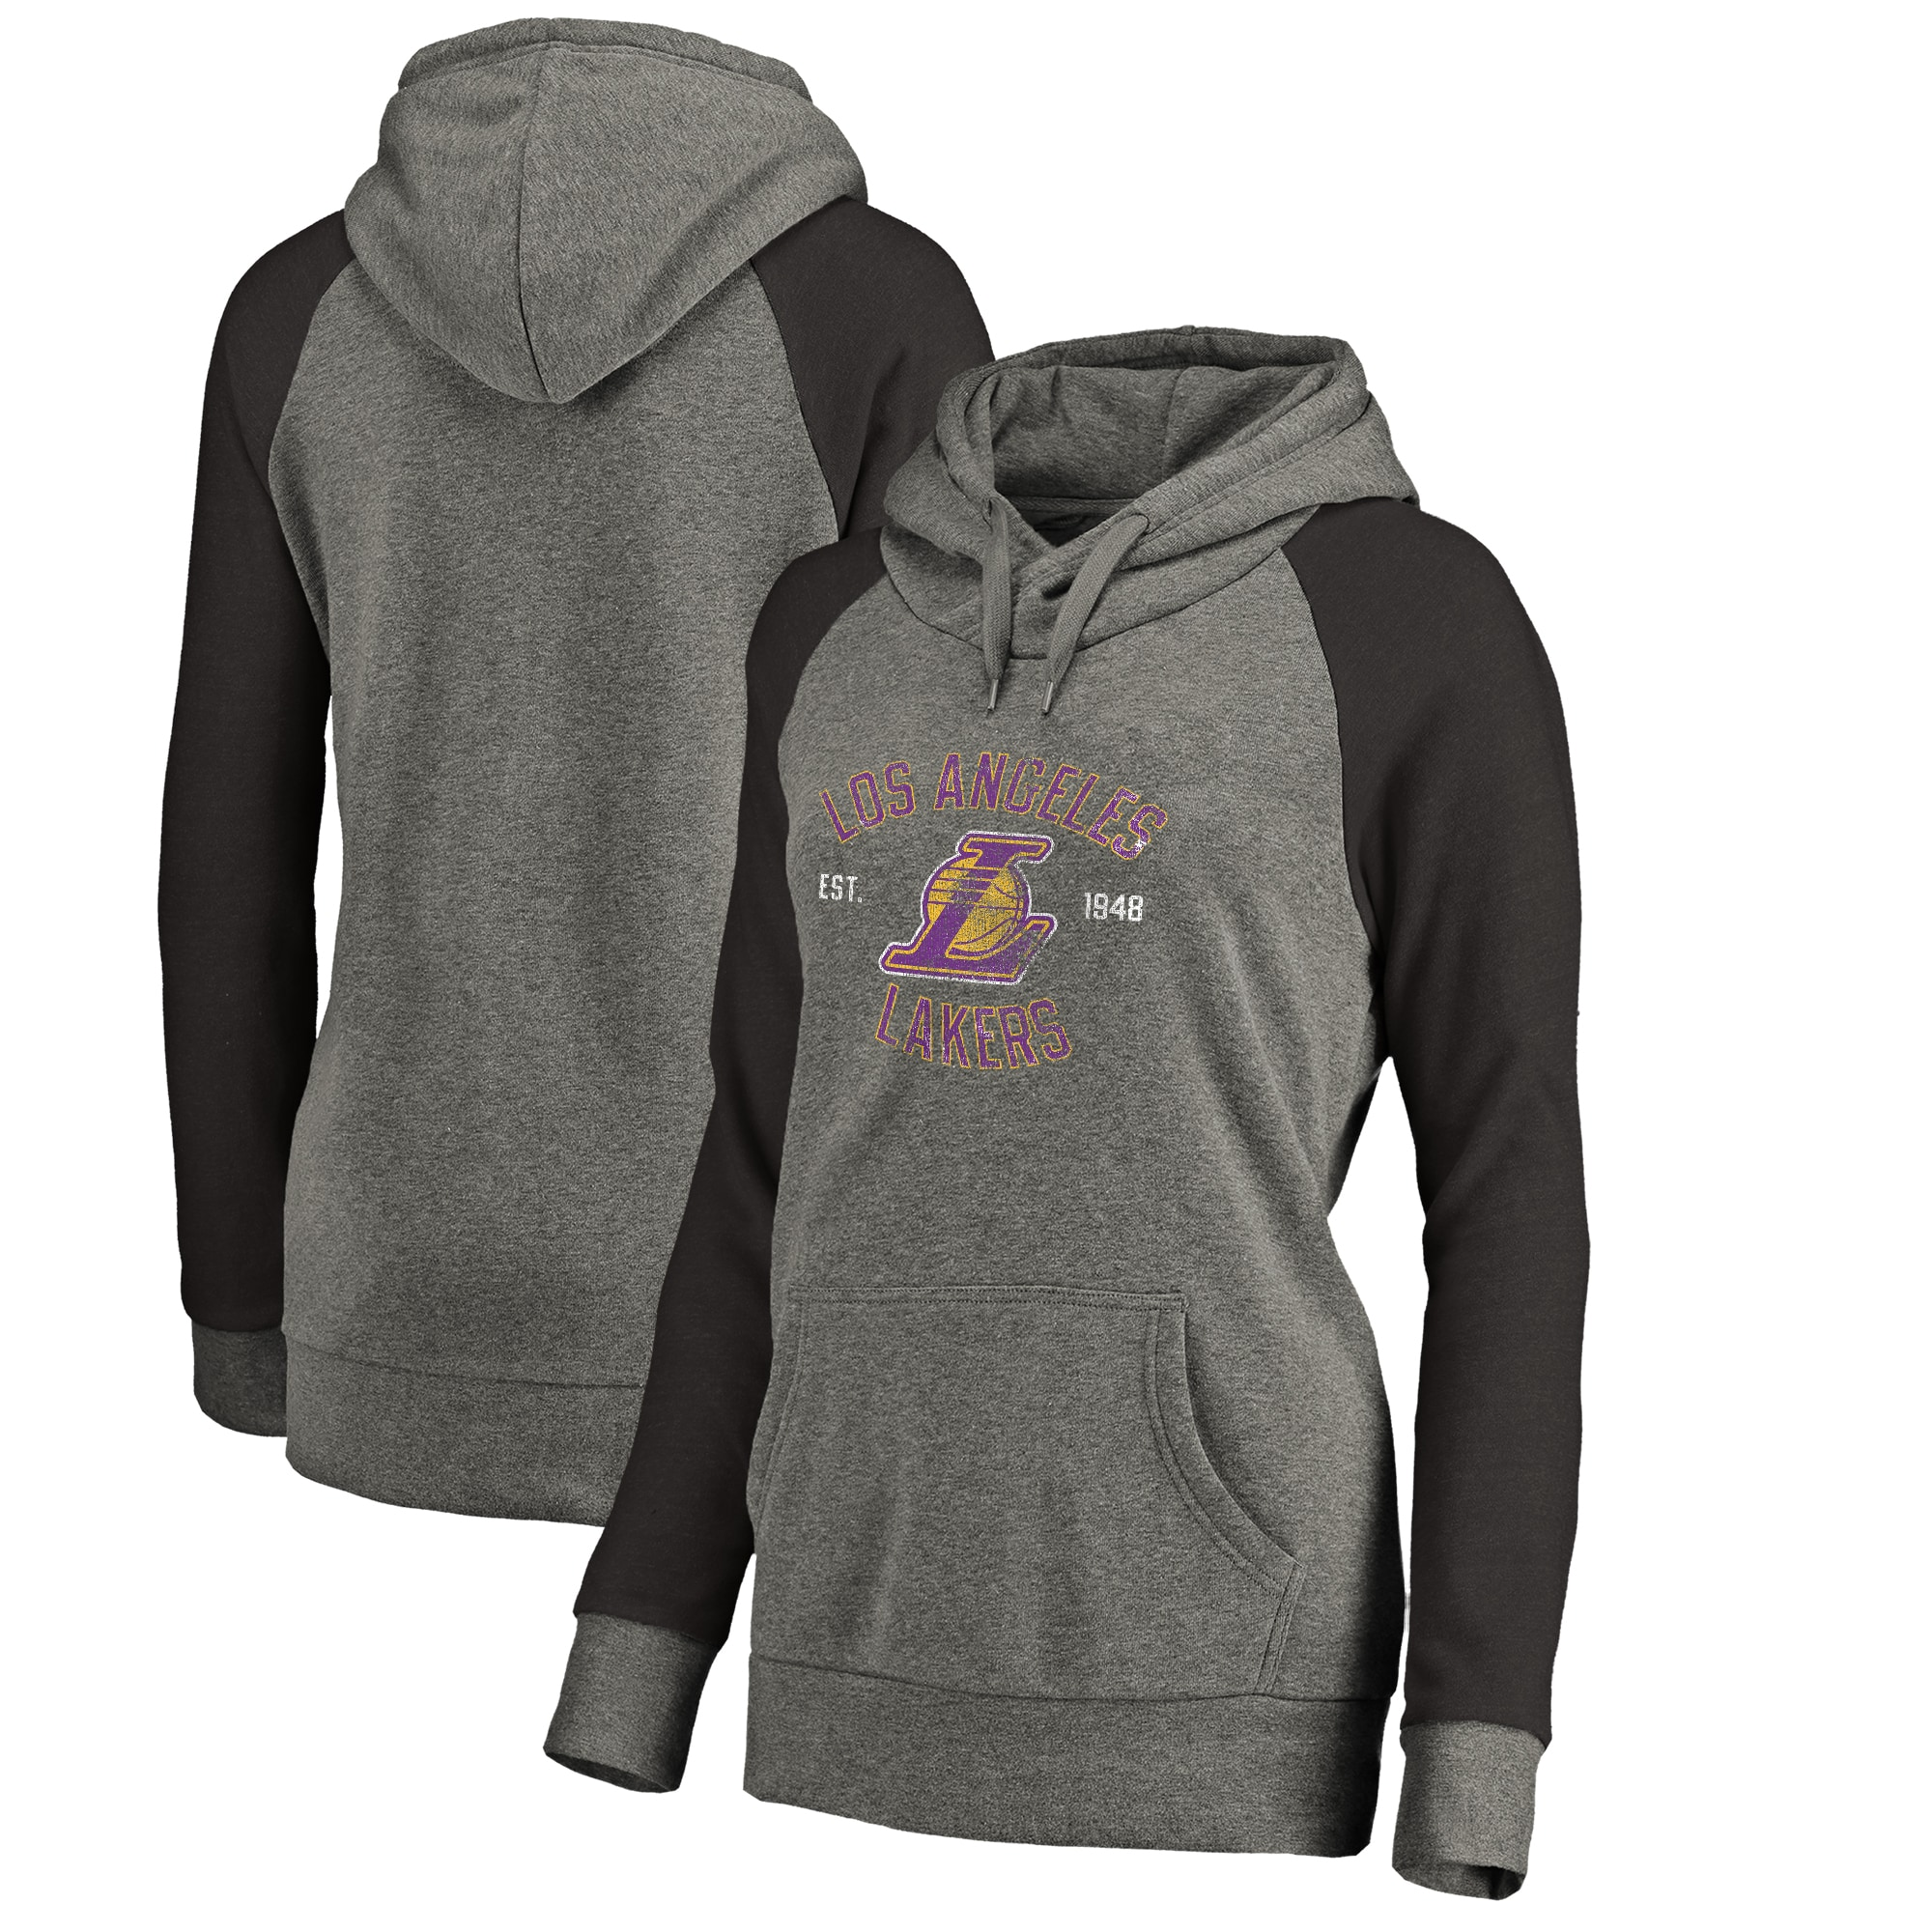 Los Angeles Lakers Fanatics Branded Women's Heritage Tri-Blend Raglan Plus Size Pullover Hoodie - Heathered Gray